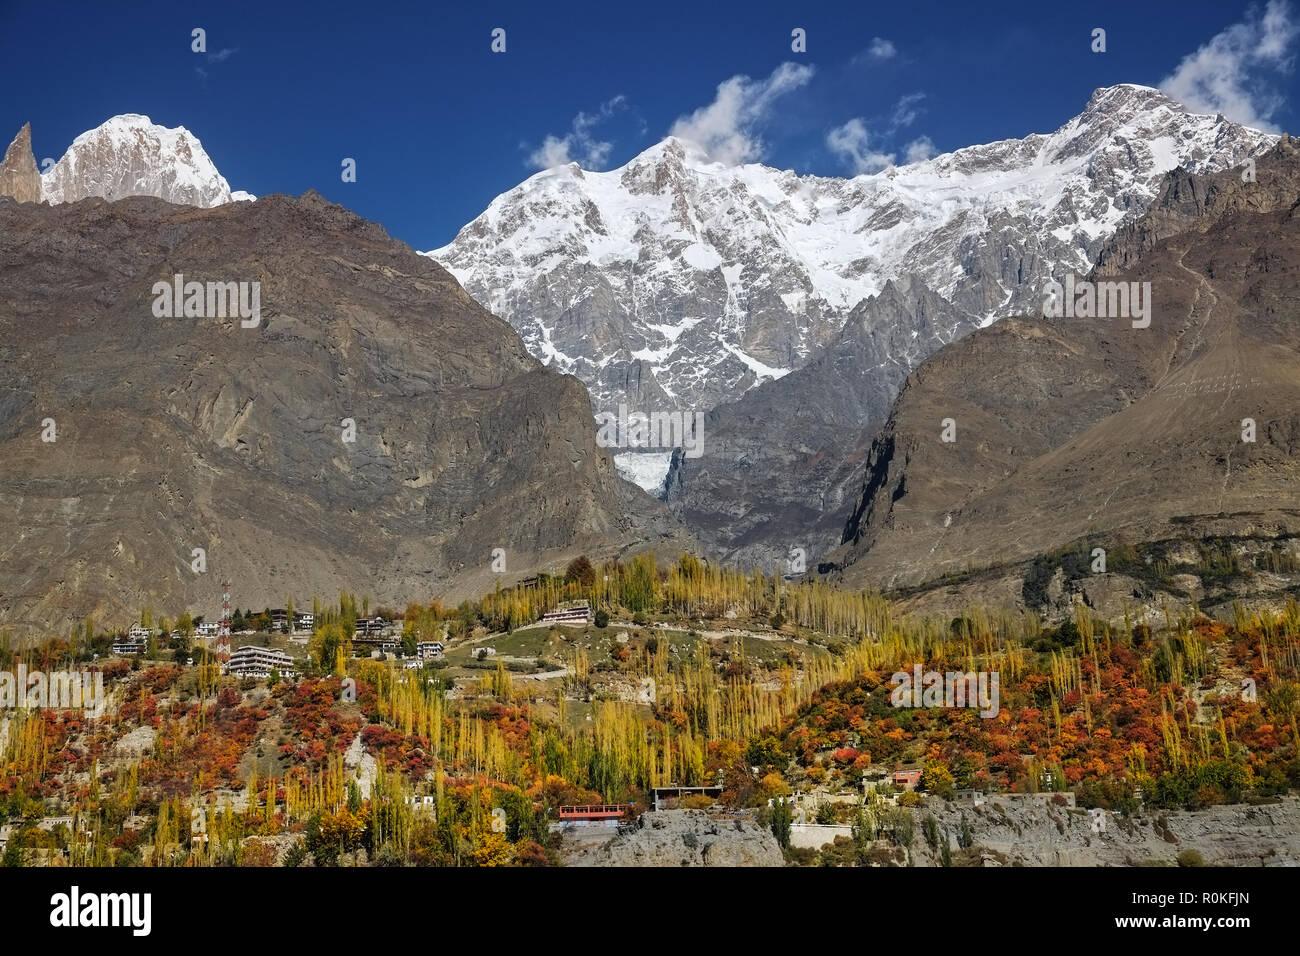 Colorful Karimabad in autumn. Hunza valley, Gilgit-Baltistan, Pakistan. - Stock Image